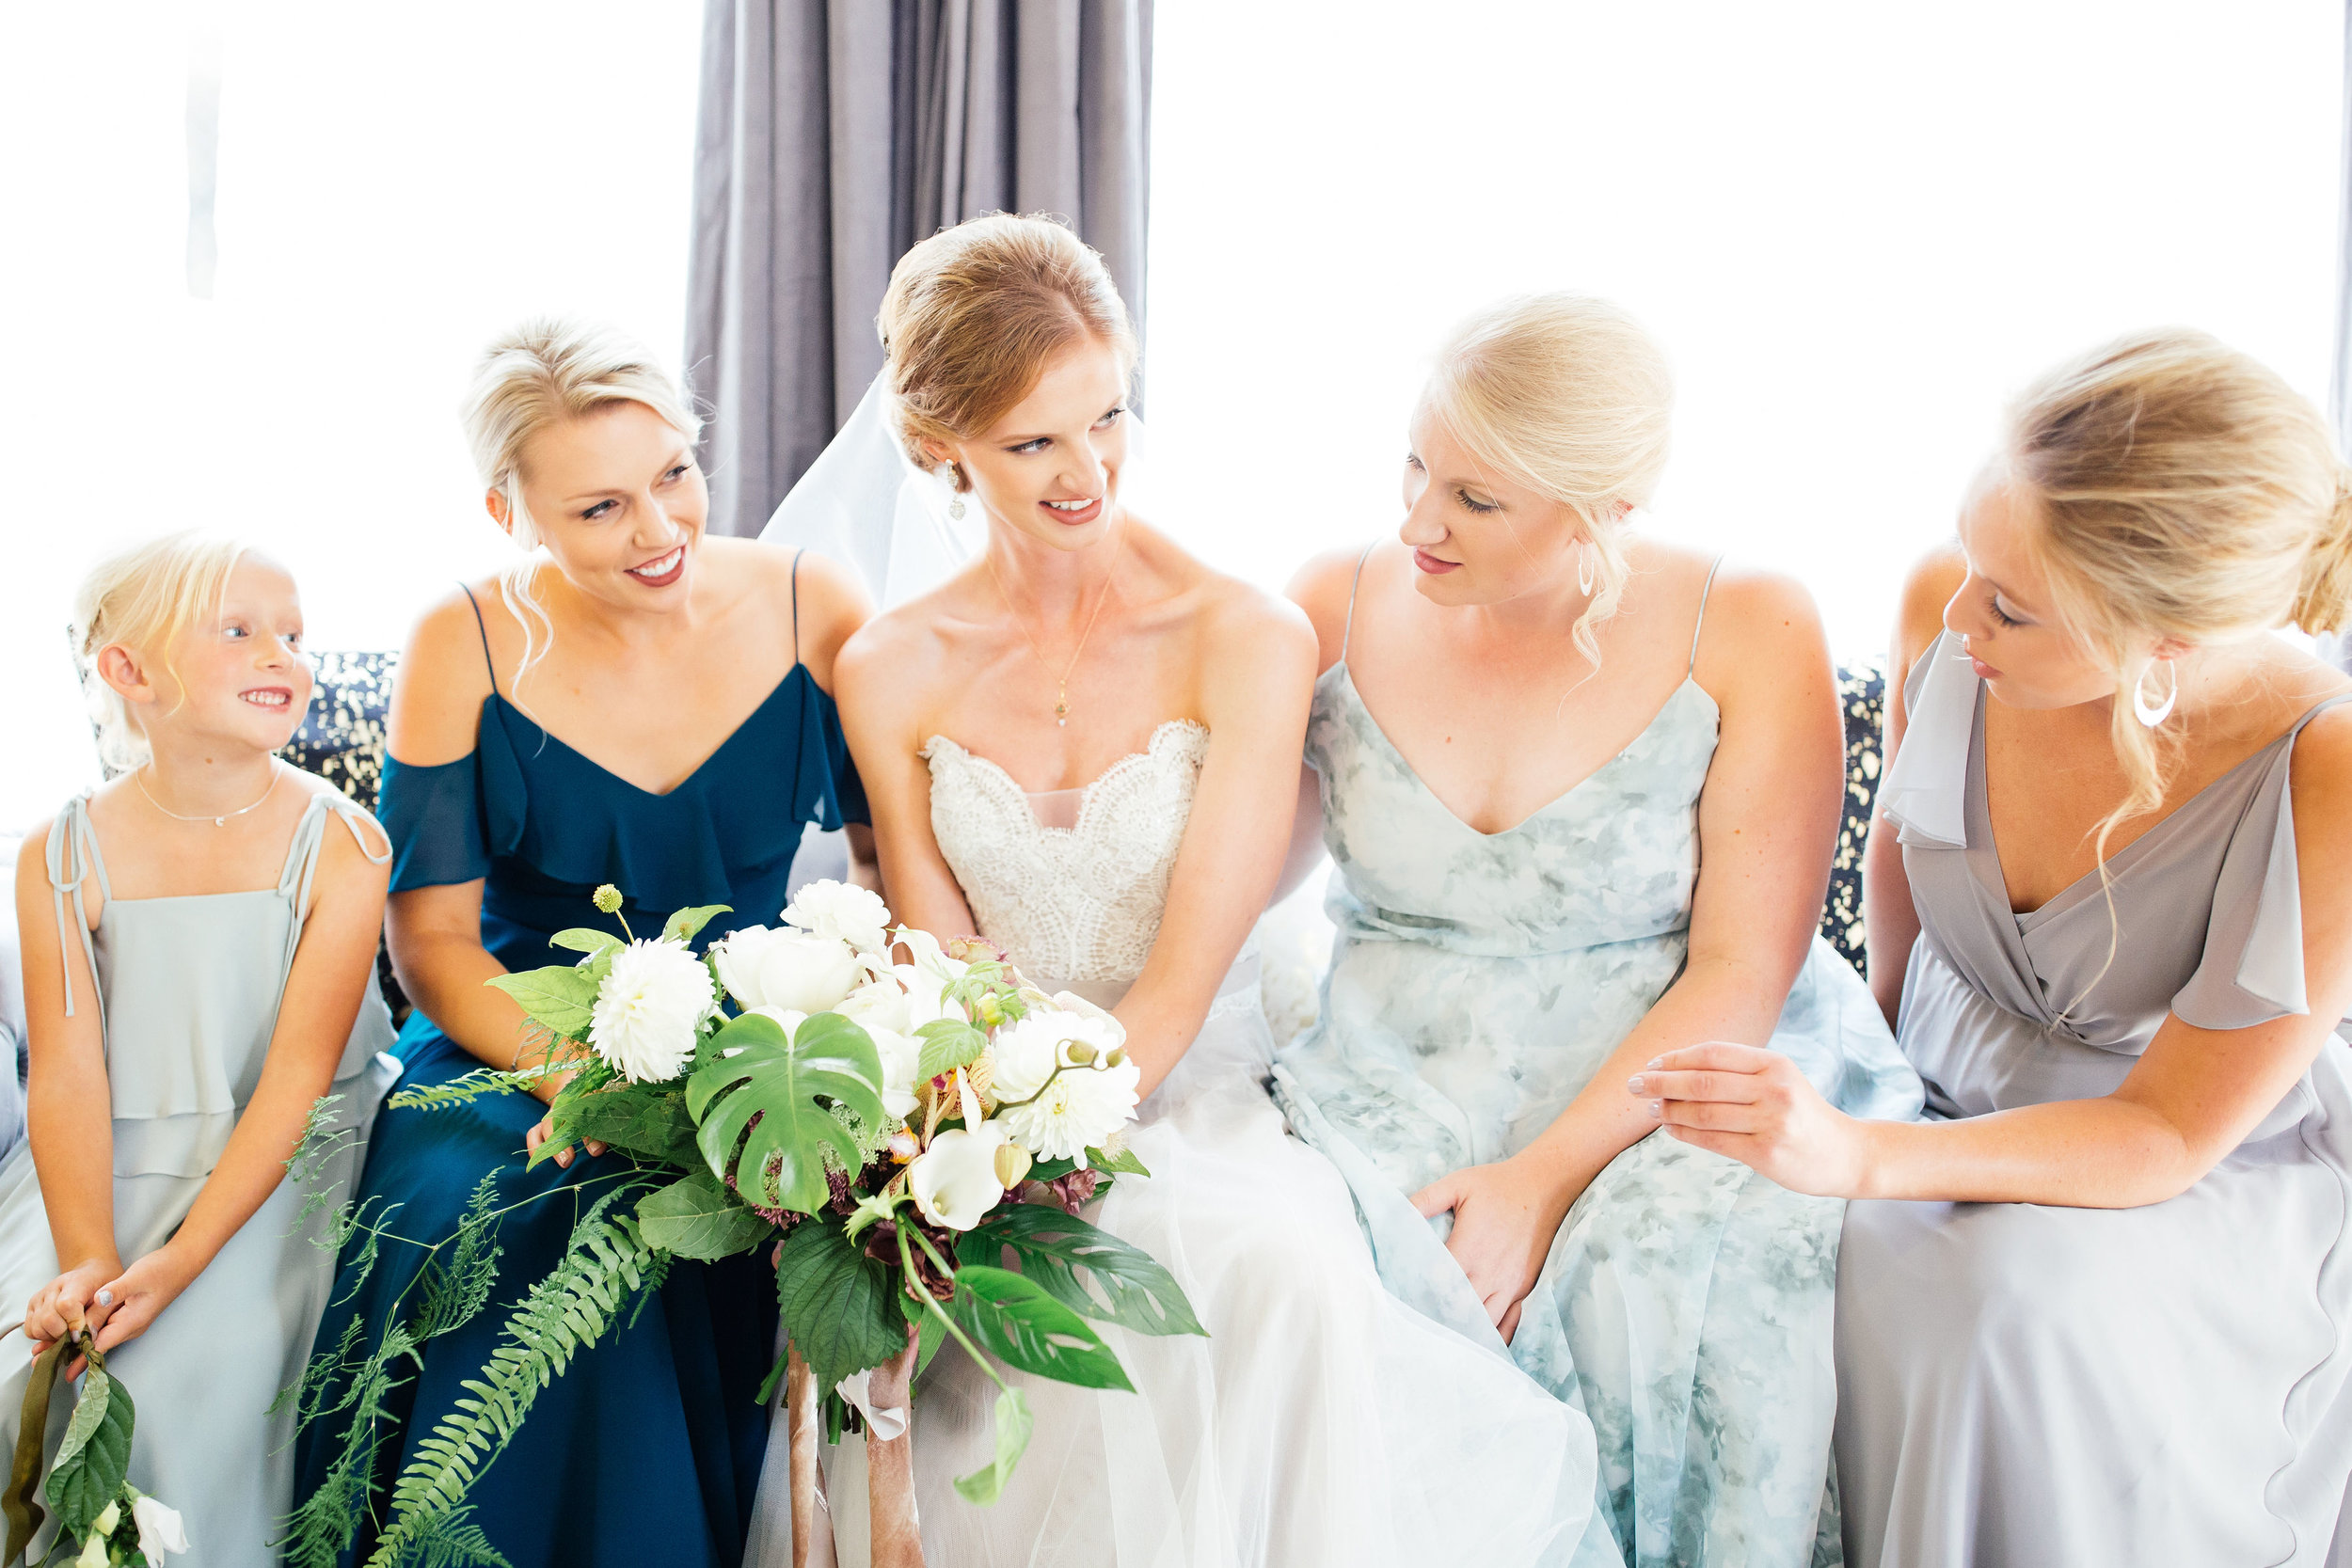 Lumber Exchange wedding photos